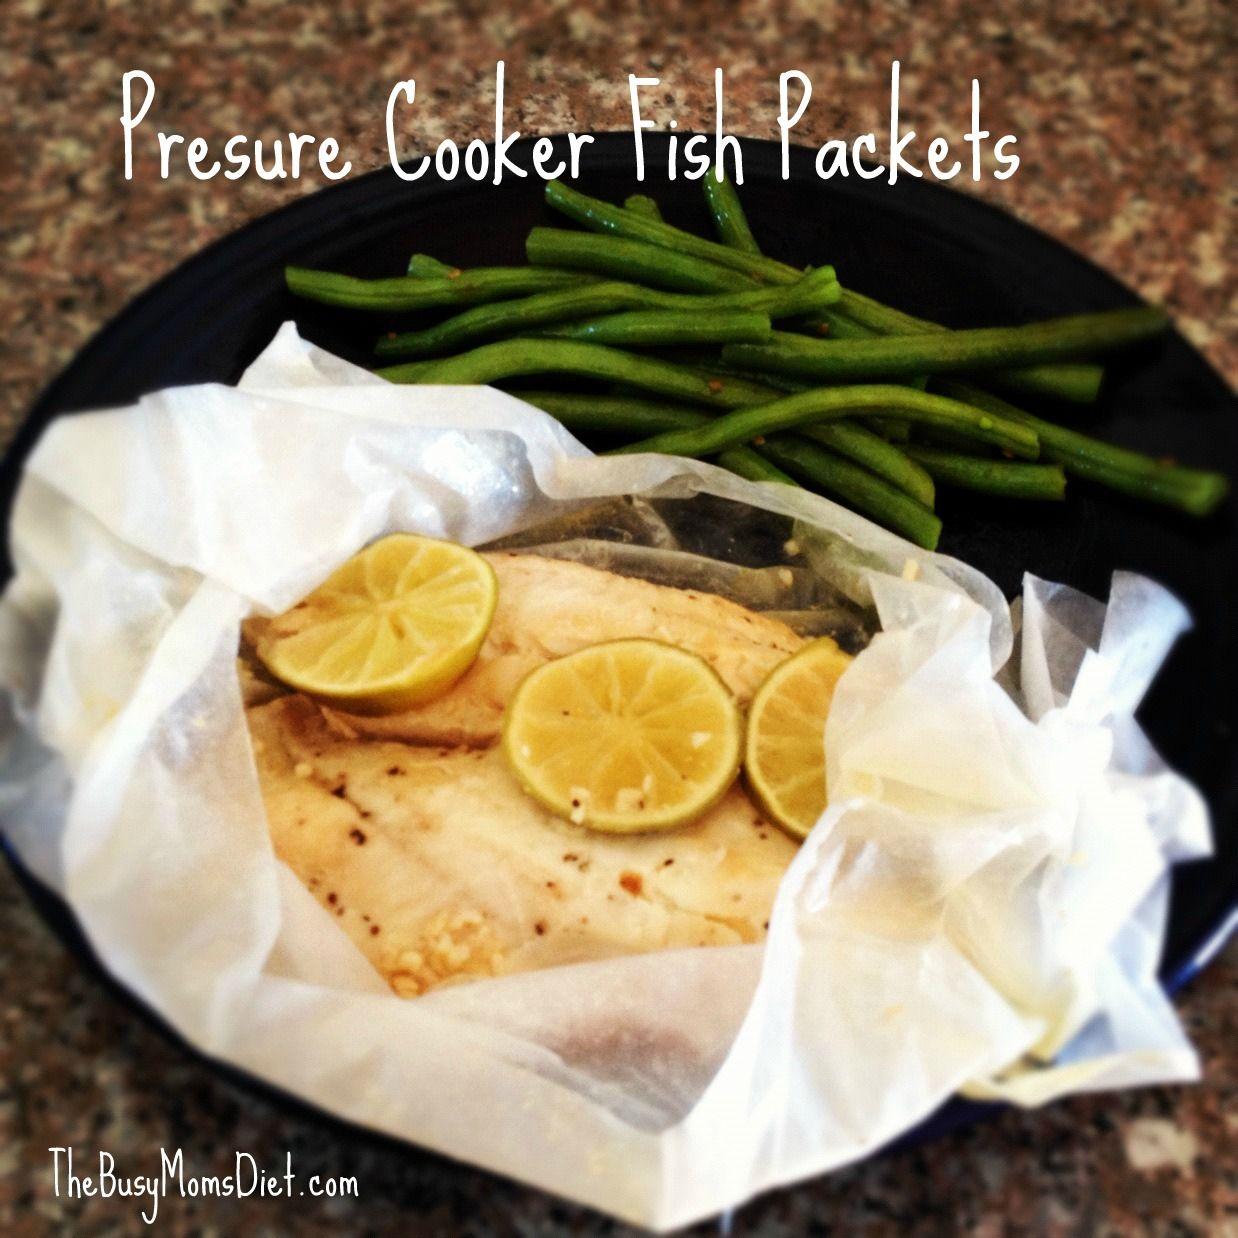 Pressure Cooker Fish